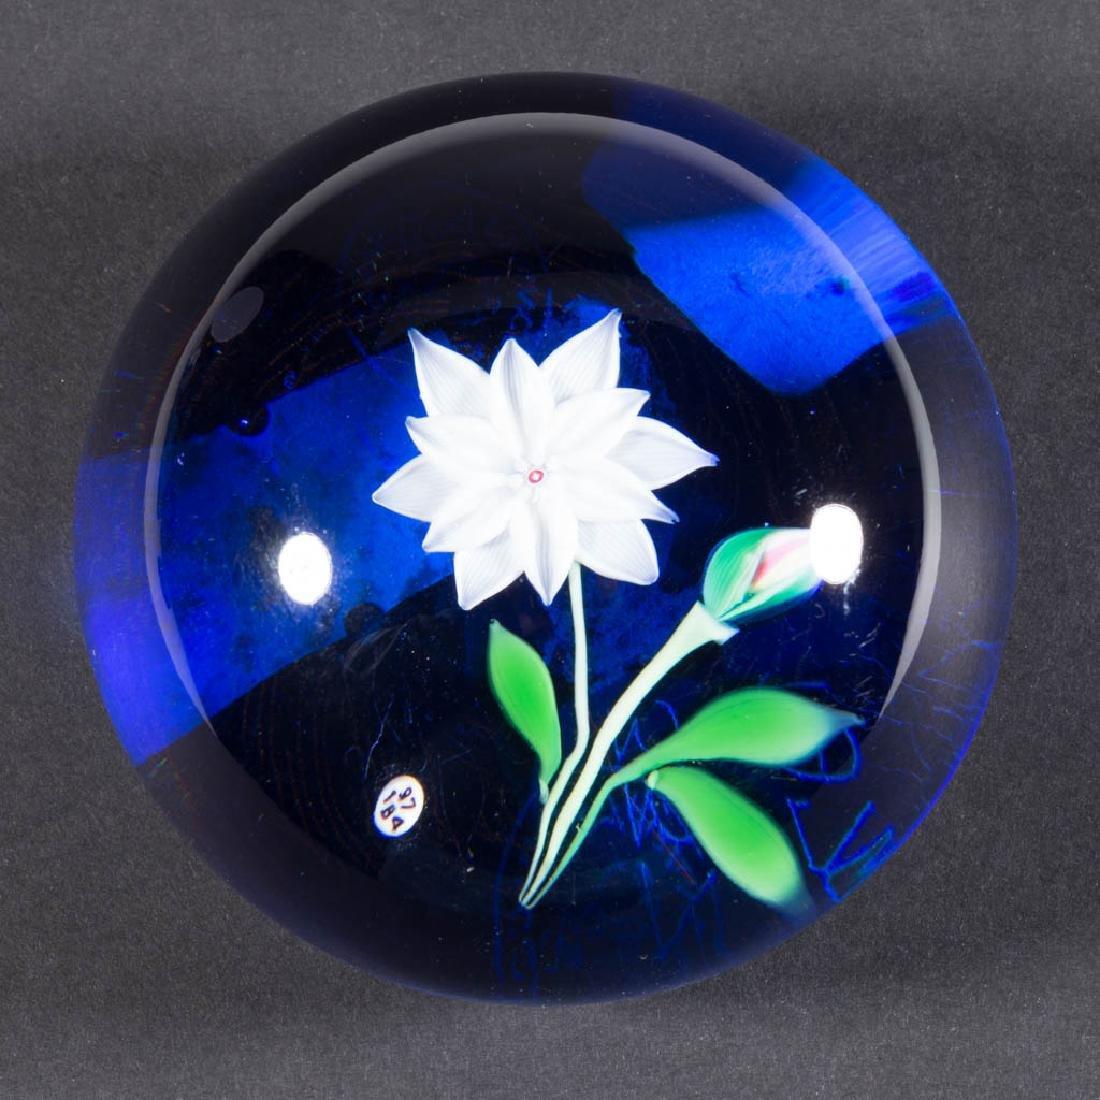 CONTEMPORARY BACCARAT ART GLASS LAMPWORK PAPERWEIGHT